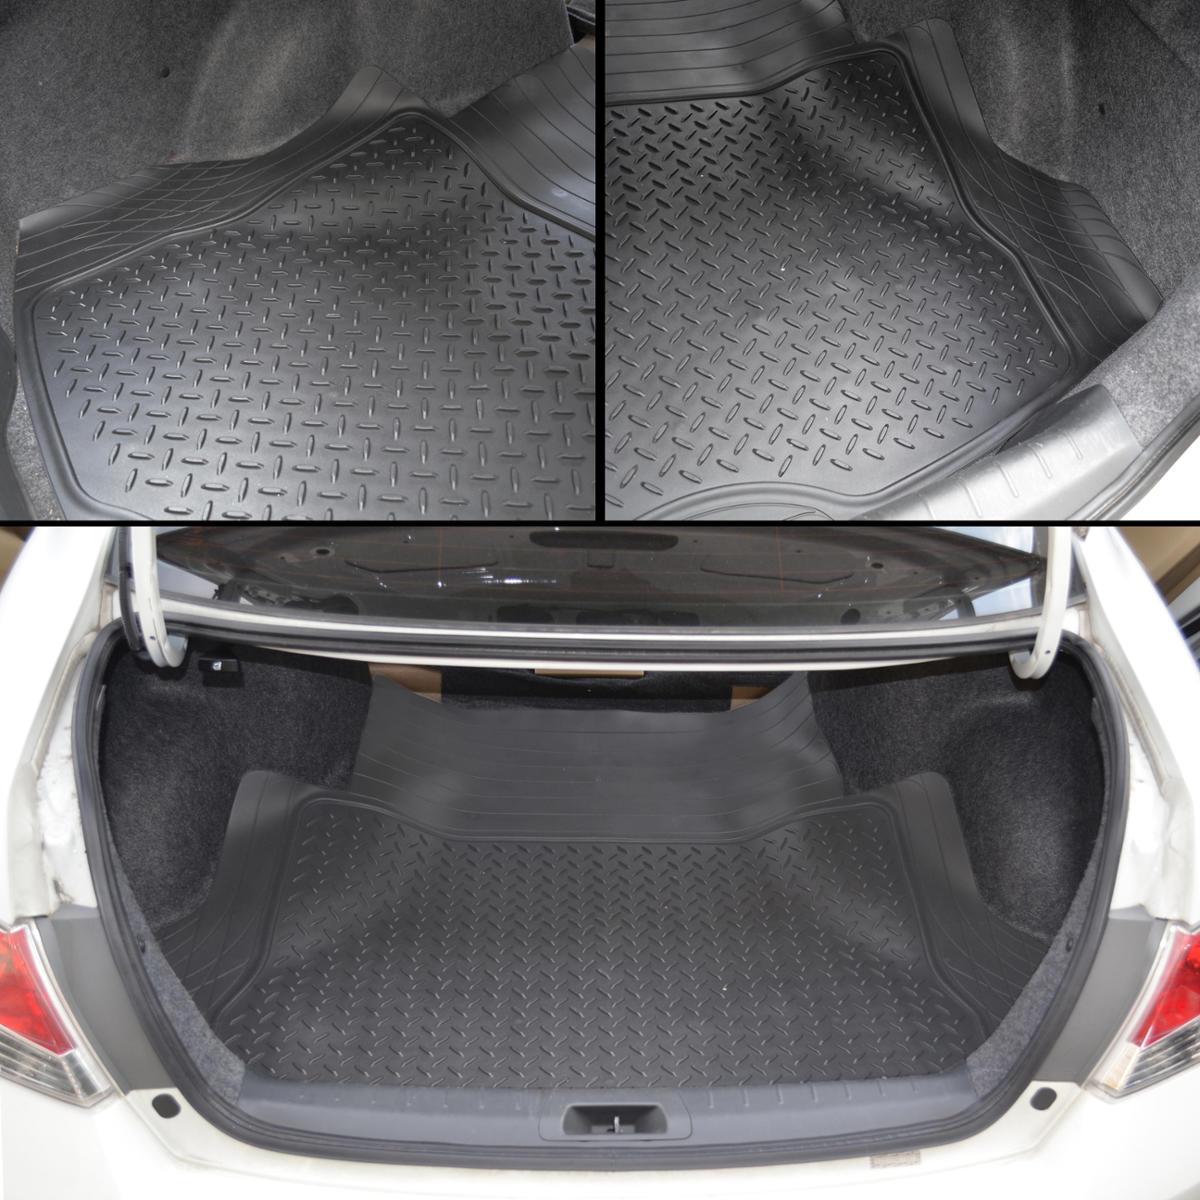 odor free cargo trunk liner mat for car van suvs trimmable rubber tough beige. Black Bedroom Furniture Sets. Home Design Ideas